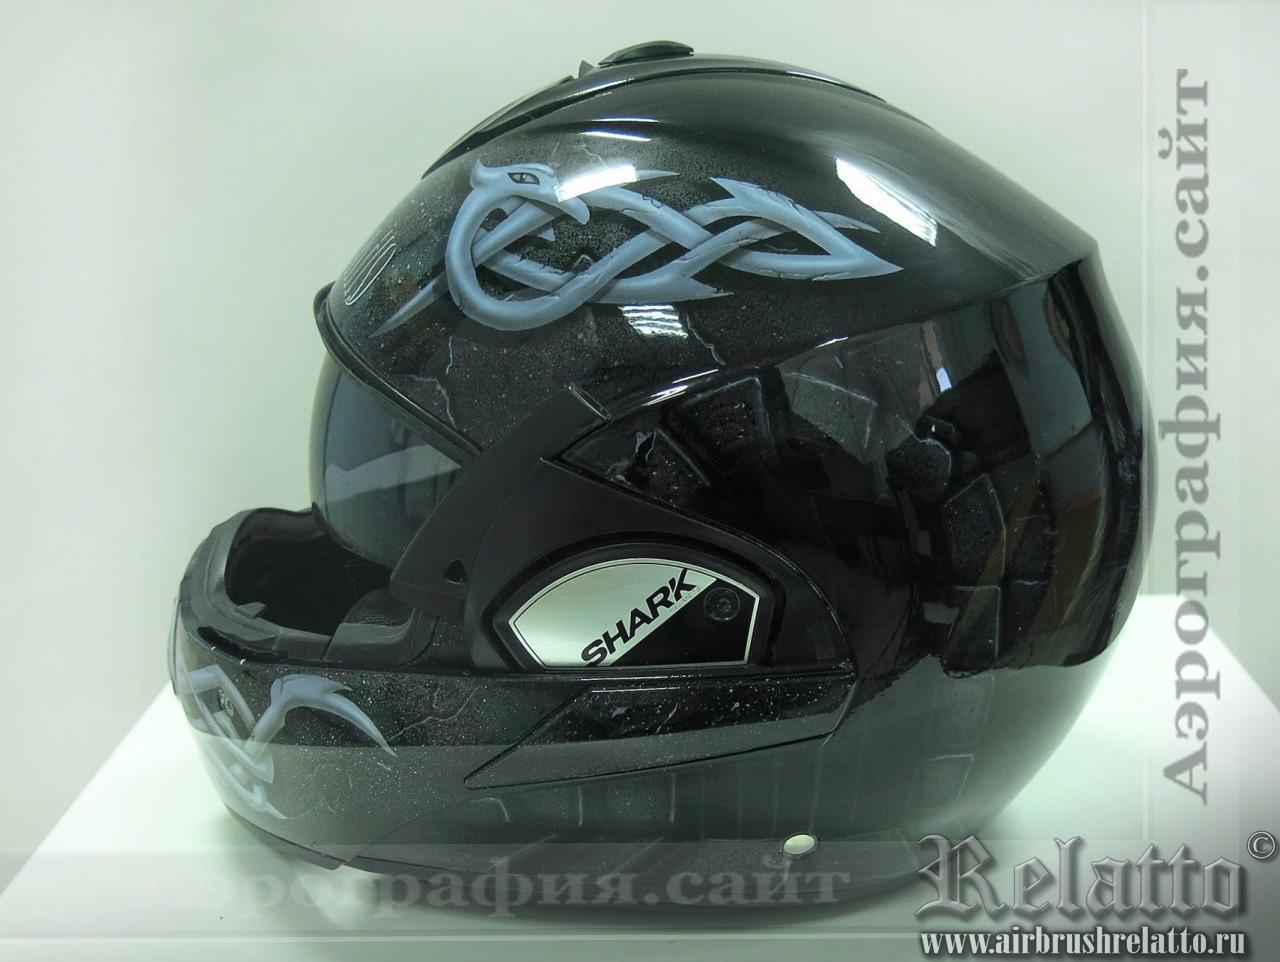 разрисовка на шлеме узоры